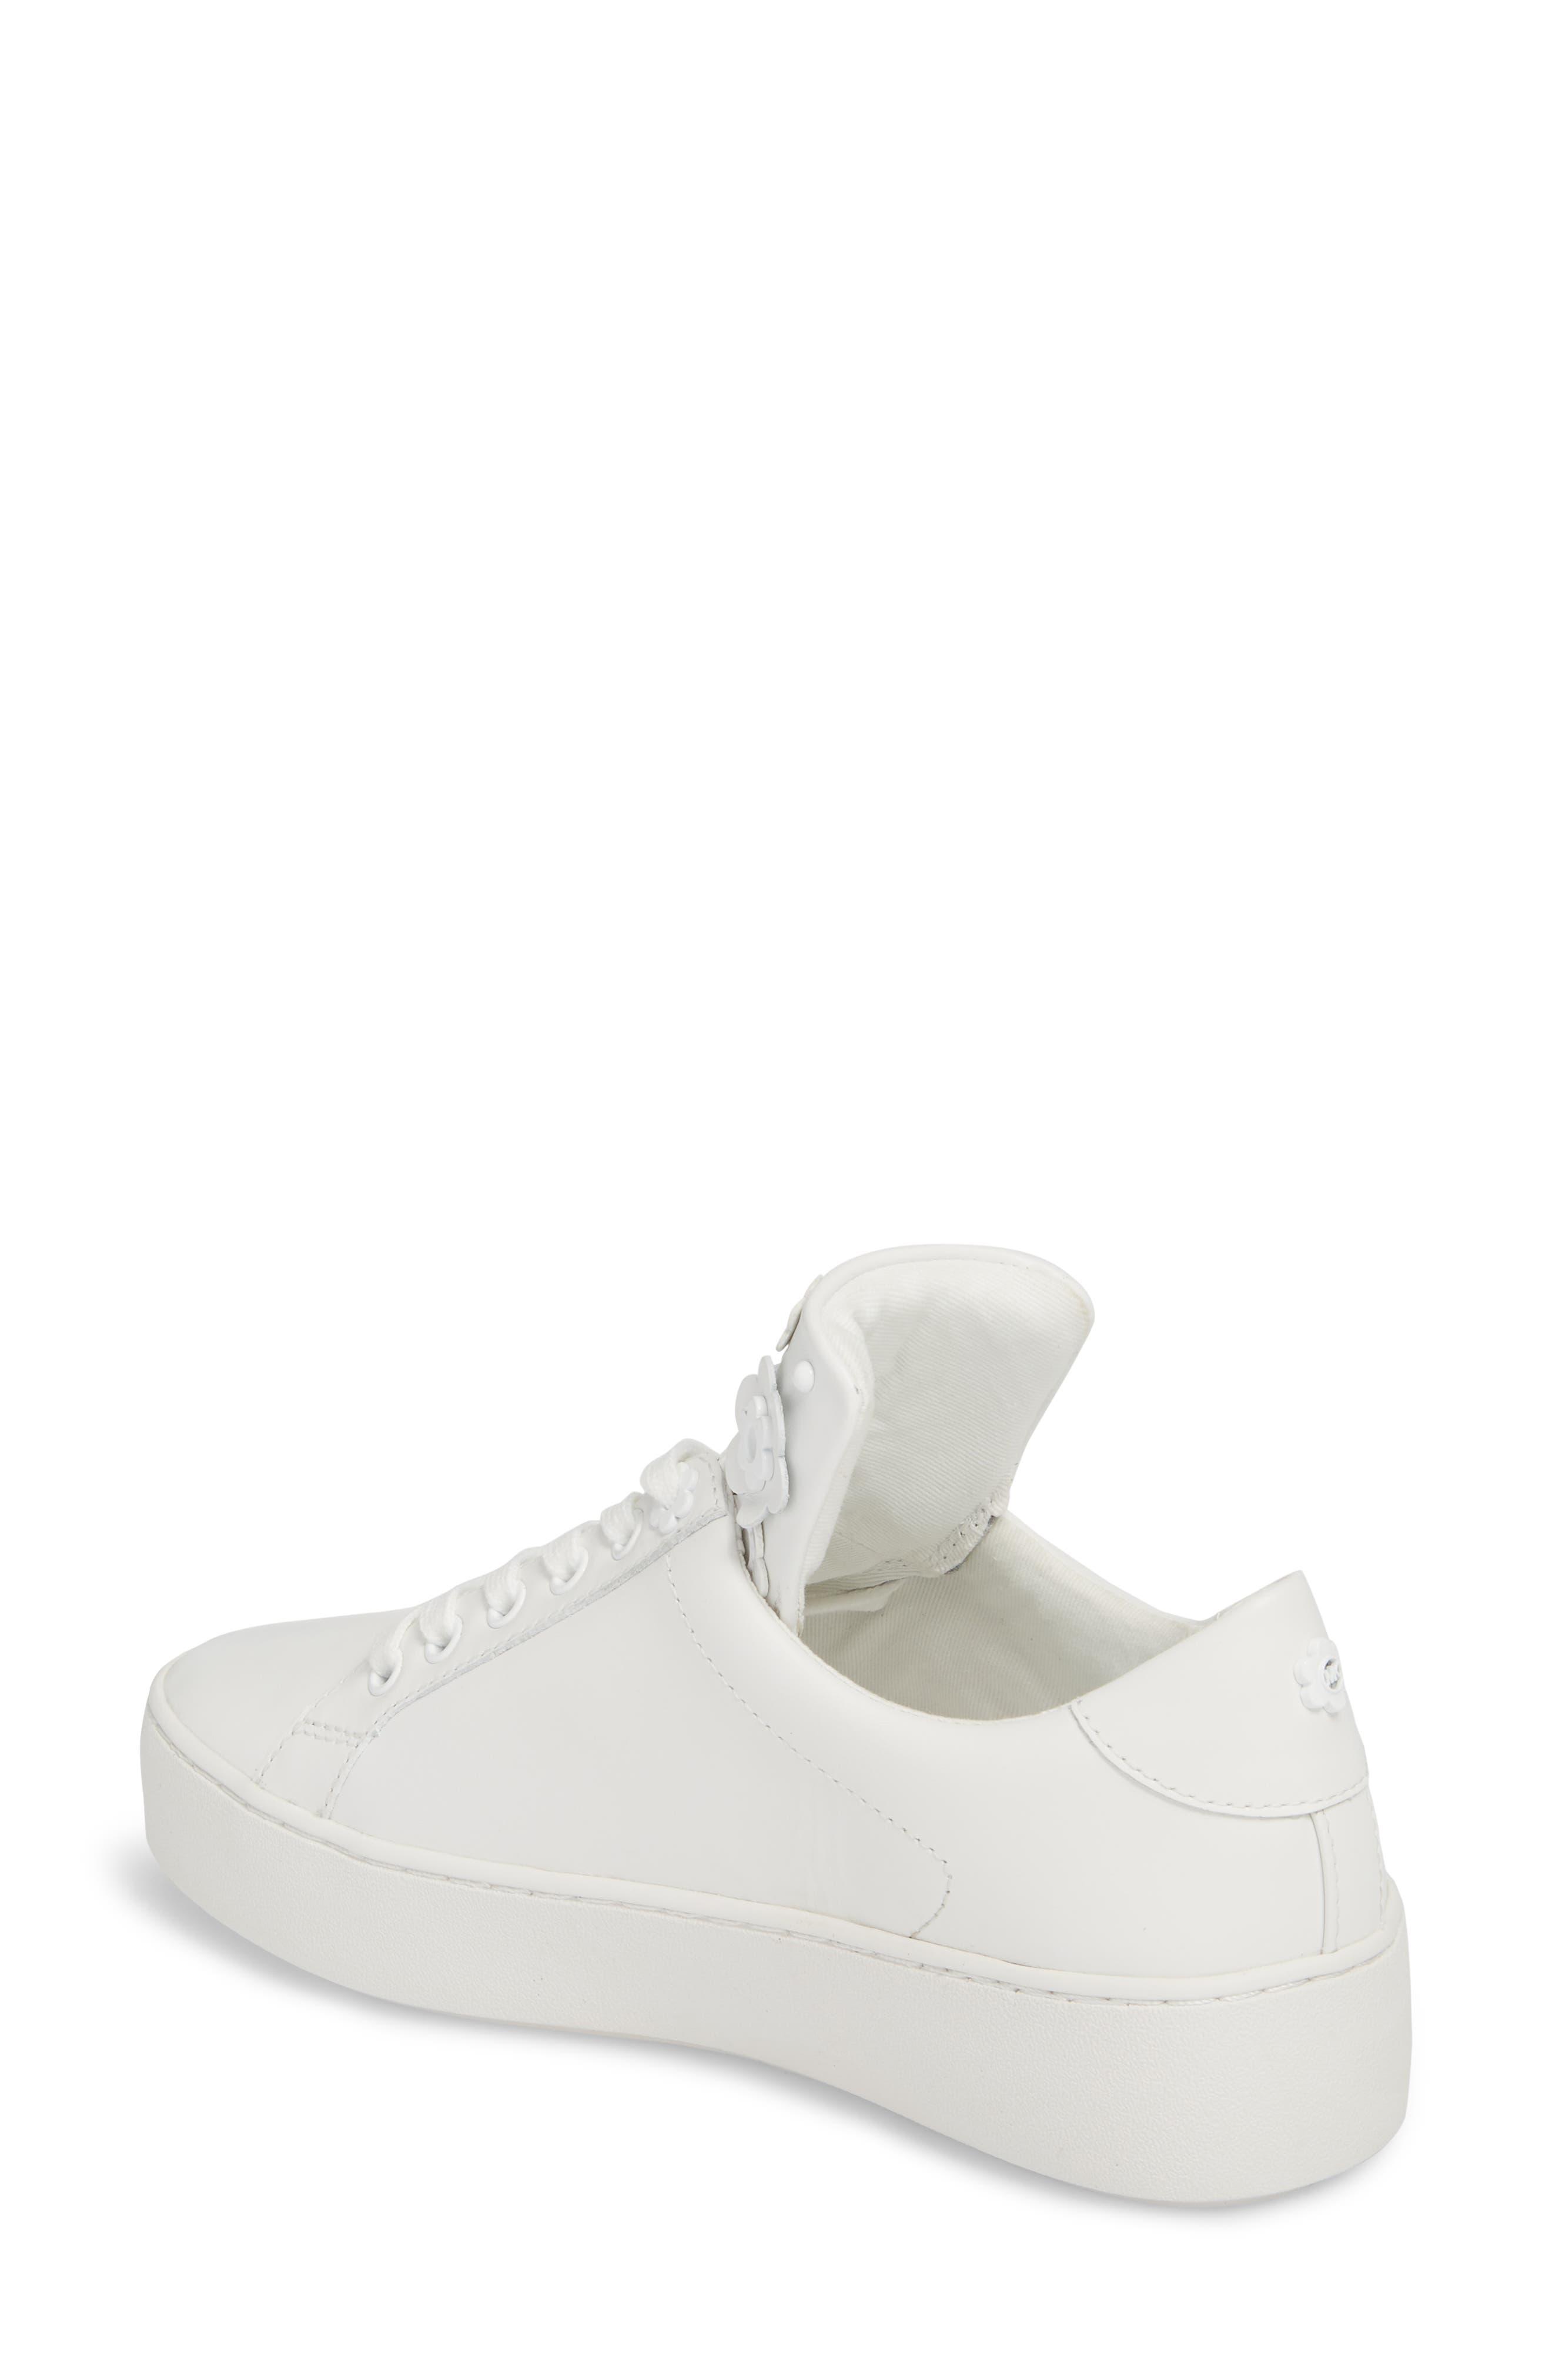 Mindy Platform Sneaker,                             Alternate thumbnail 2, color,                             Optic White